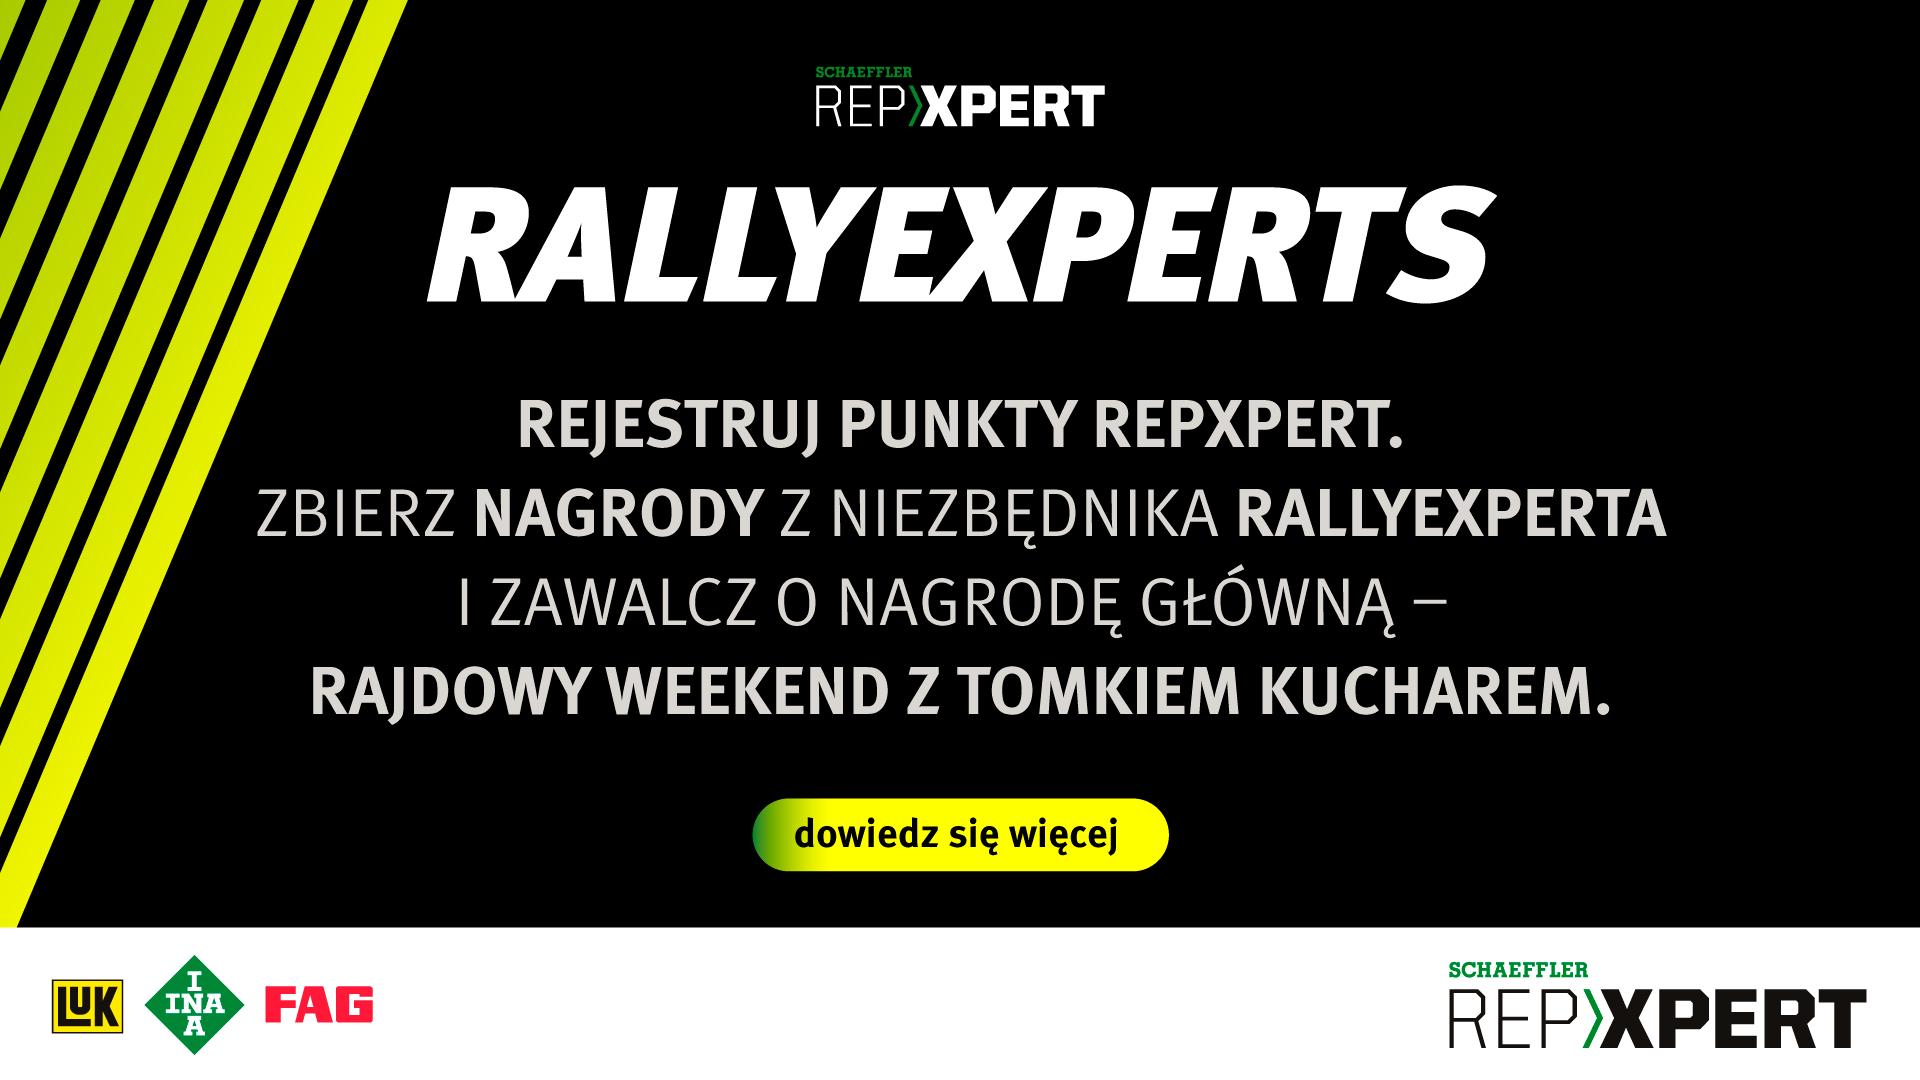 rallyexperts-banner-1920x1080-press.png